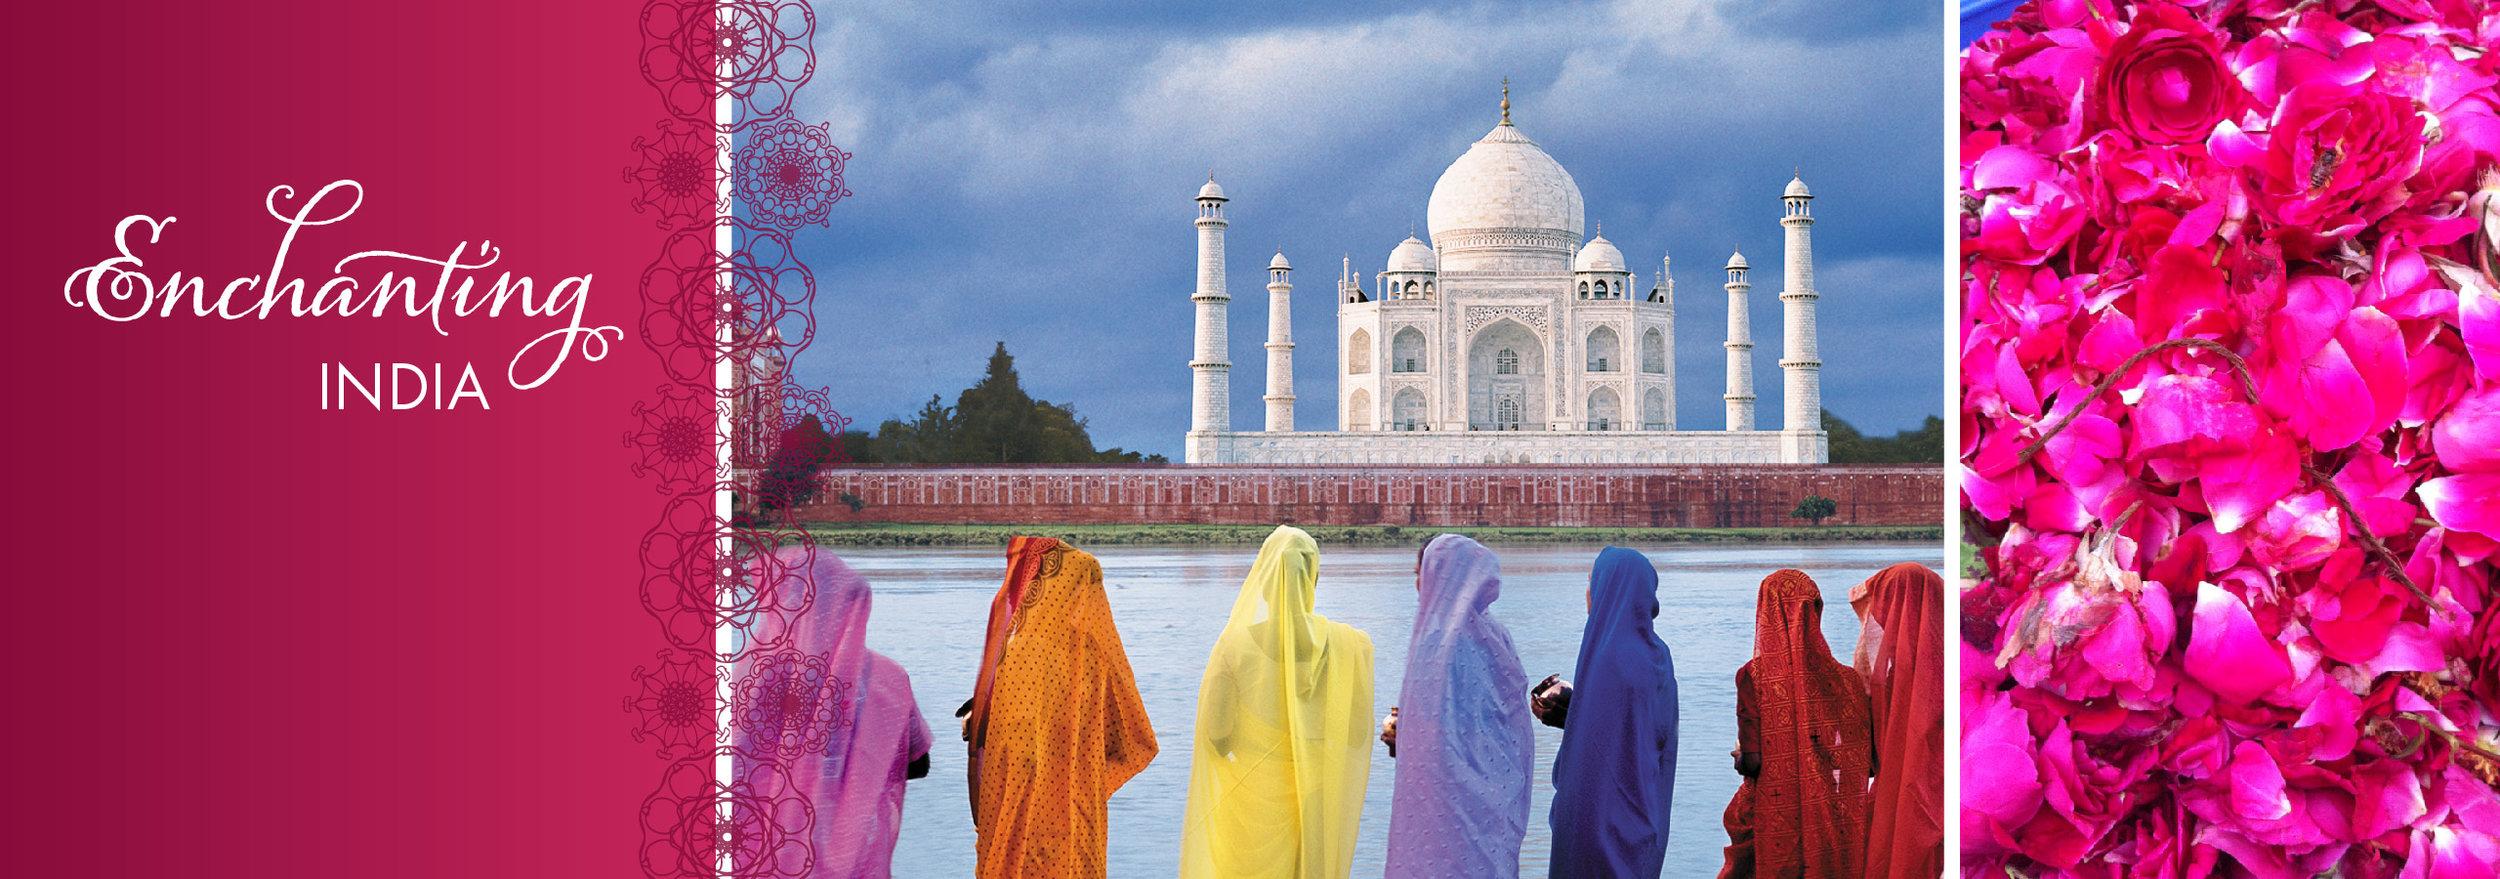 banners_x6_090317_Artboard 1 - India.jpg